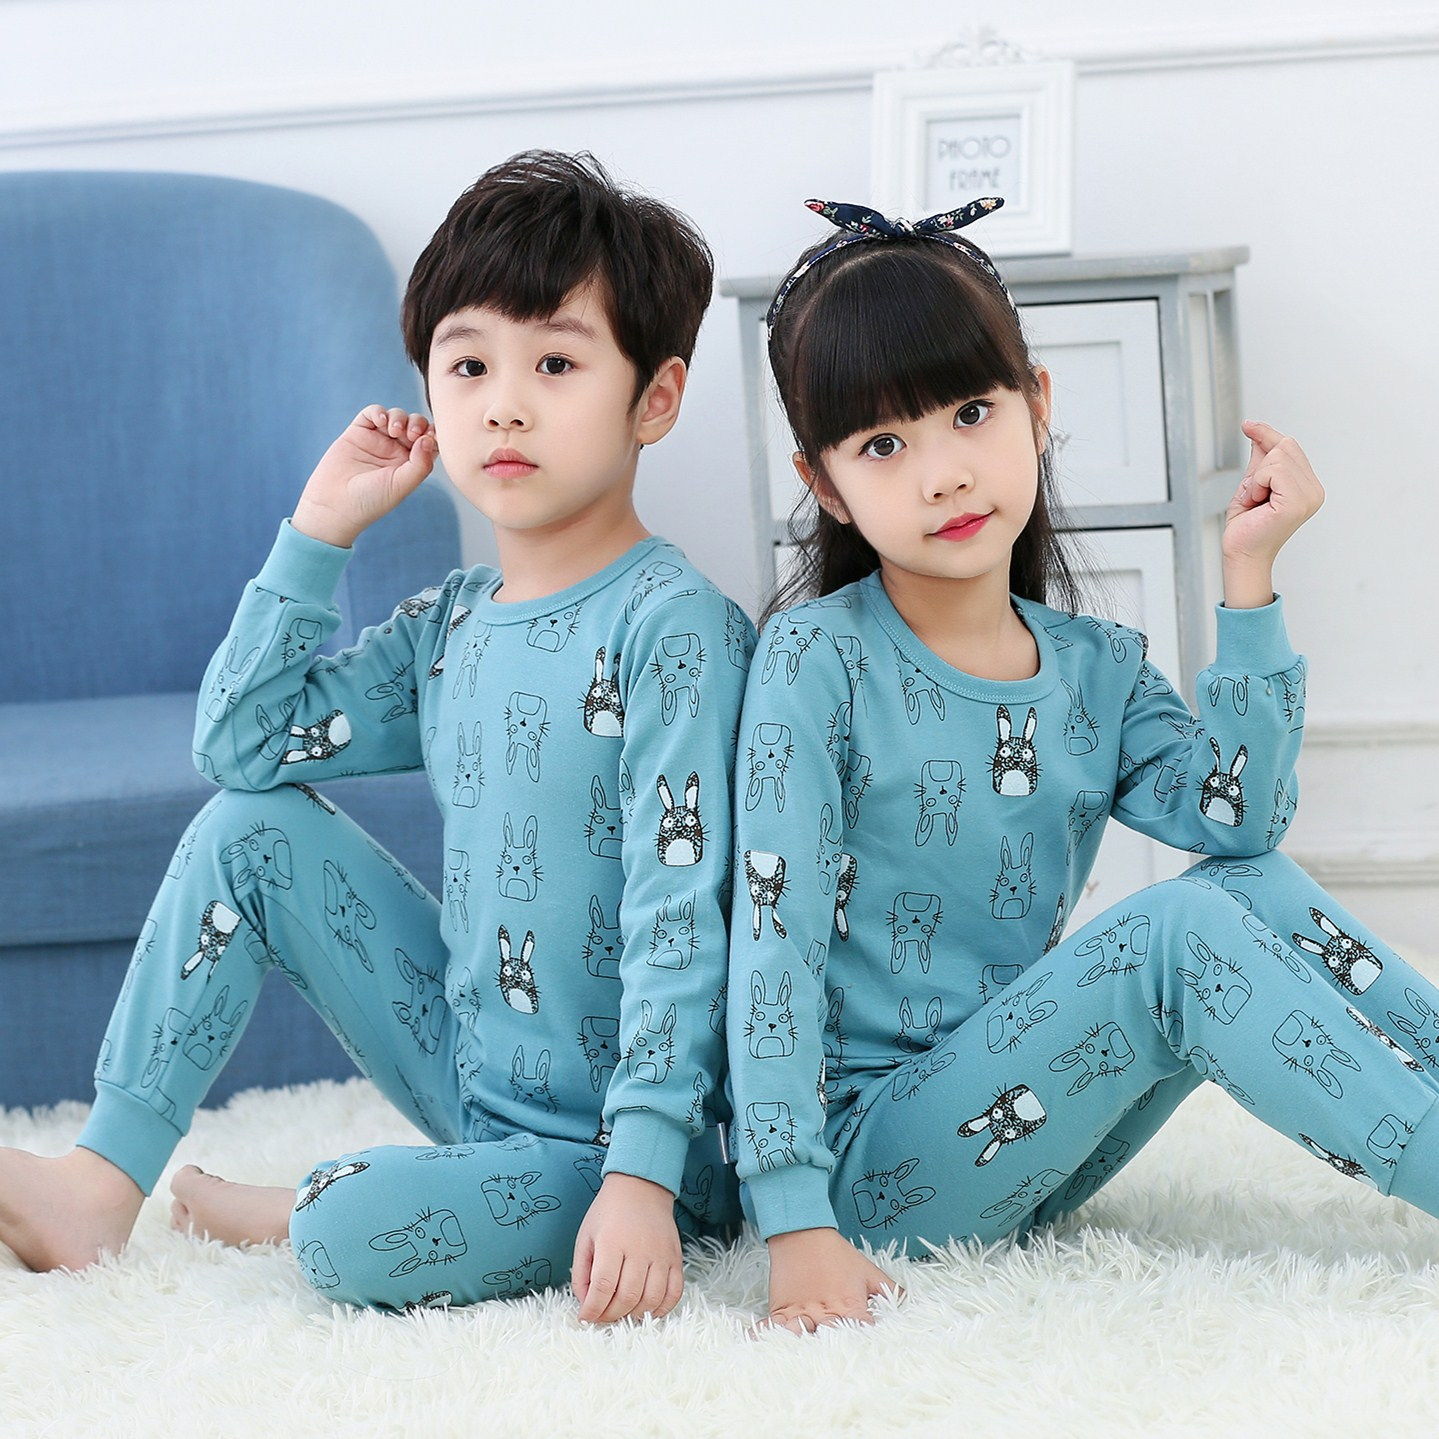 Girl Pajamas Roblox Irobuxc - All Working Roblox Robux ...